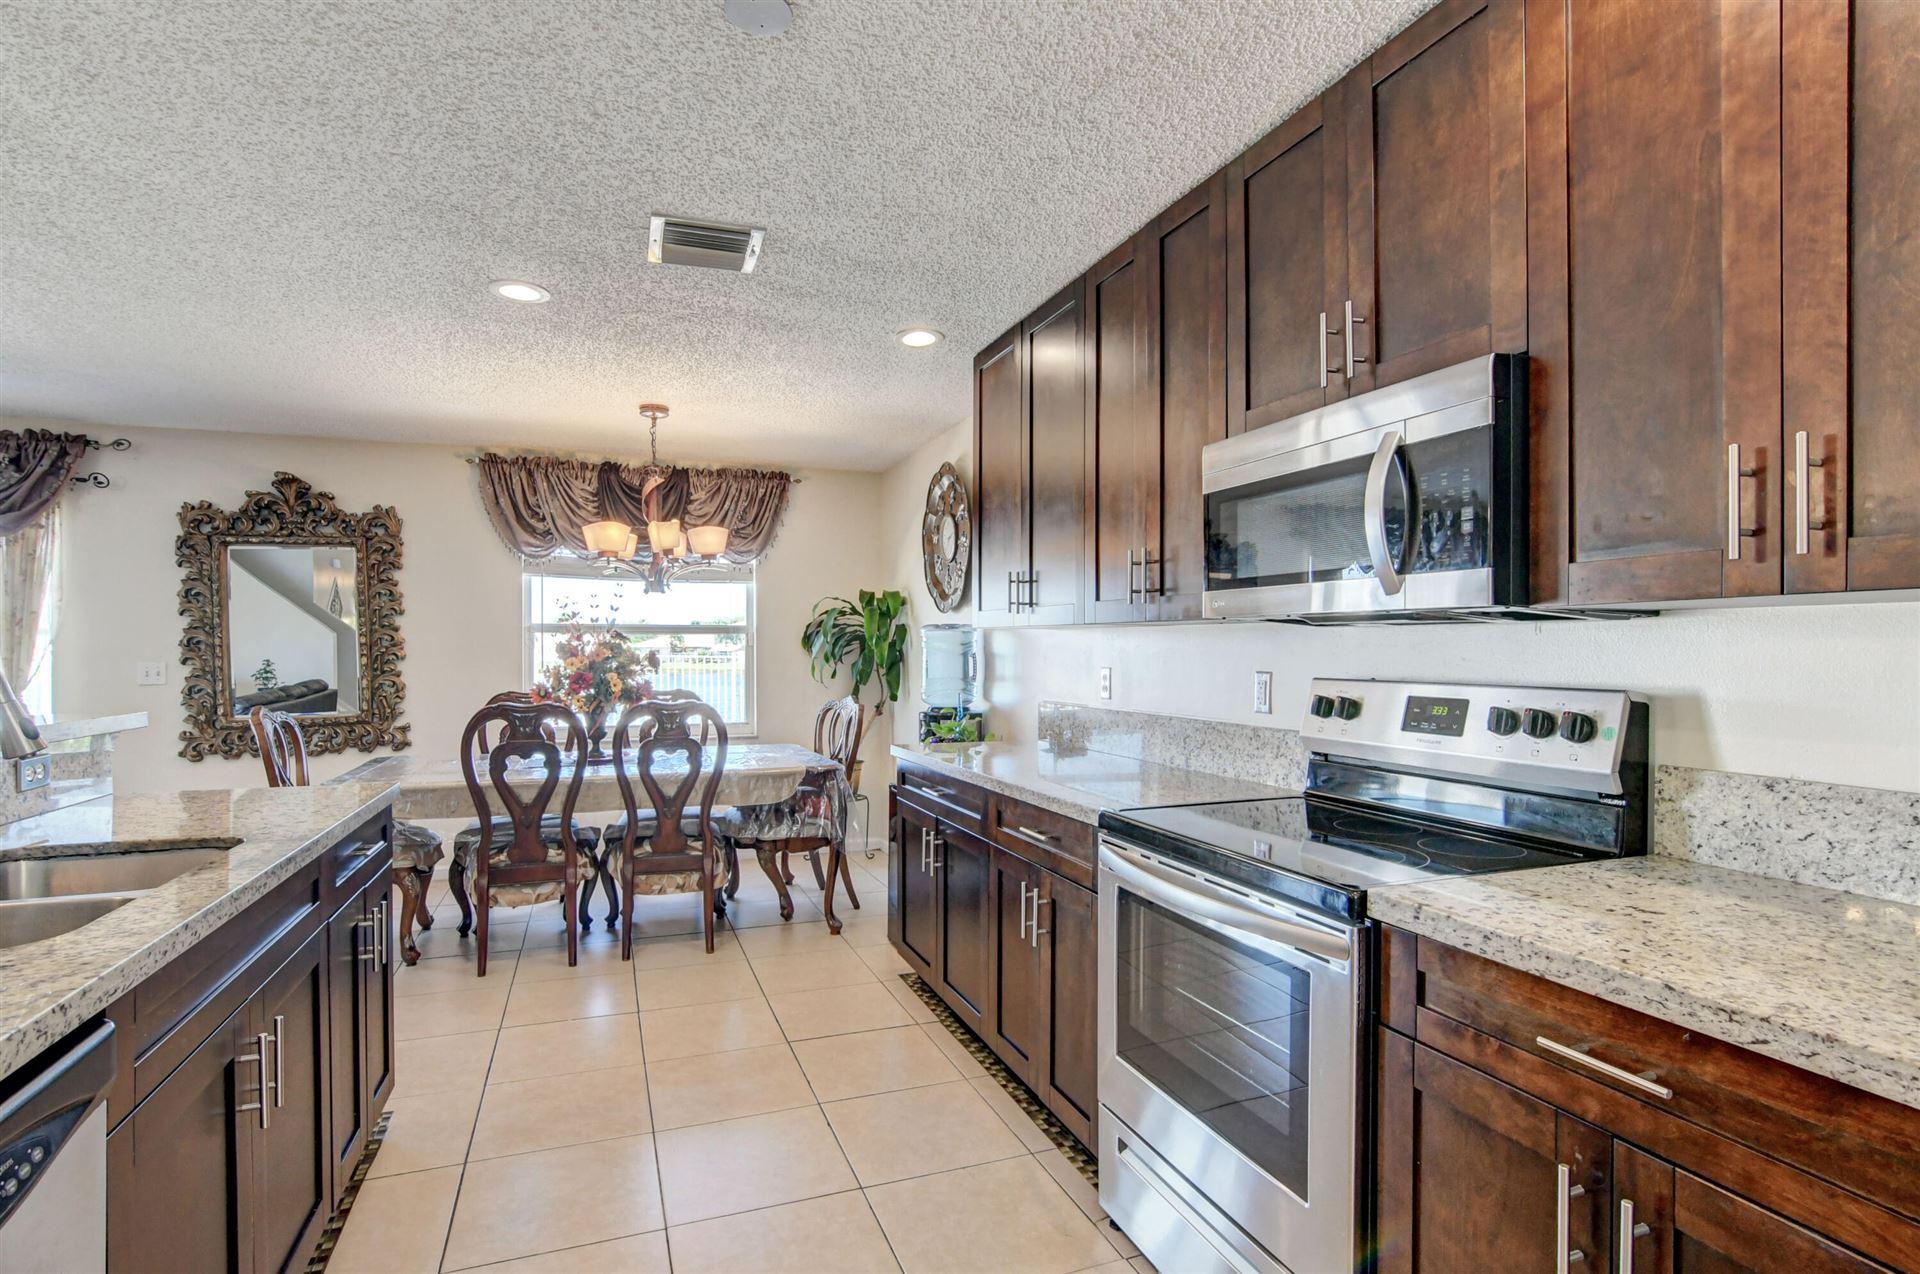 6666 Rainwood Cove Lane, Lake Worth, FL 33463 - MLS#: RX-10745017